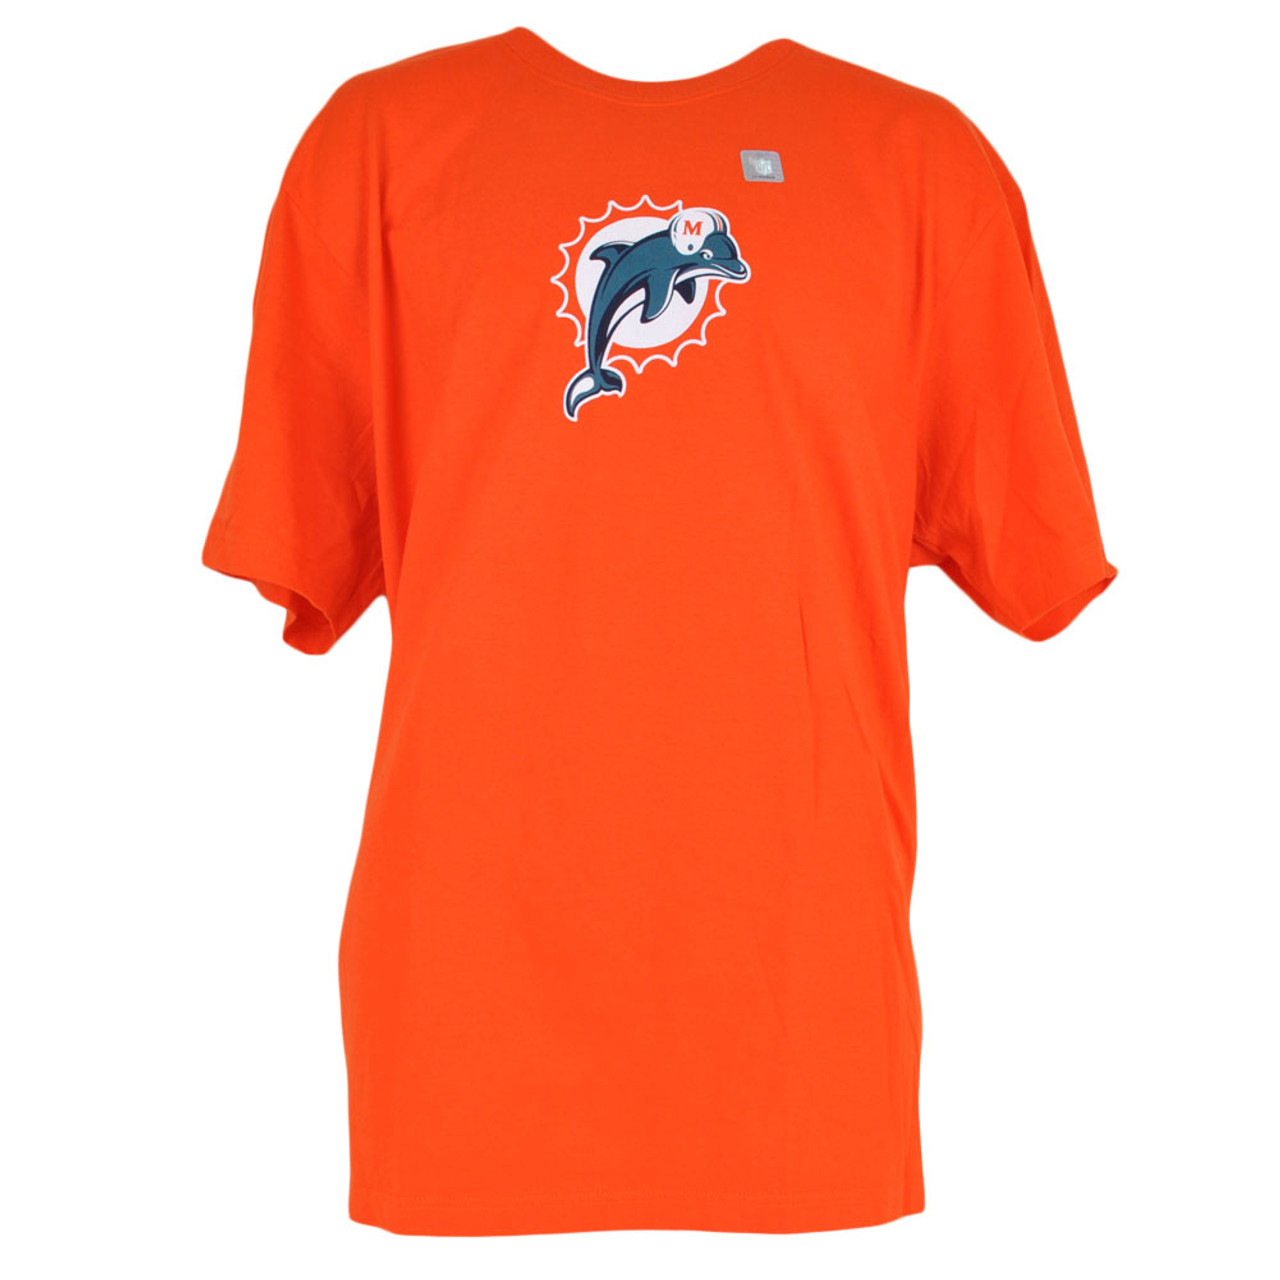 NFL Reebok Miami Dolphins Davone Bess  15 Player Tee Mens Tshirt DT2050  2XLarge - Sinbad Sports Store 45b7b8252